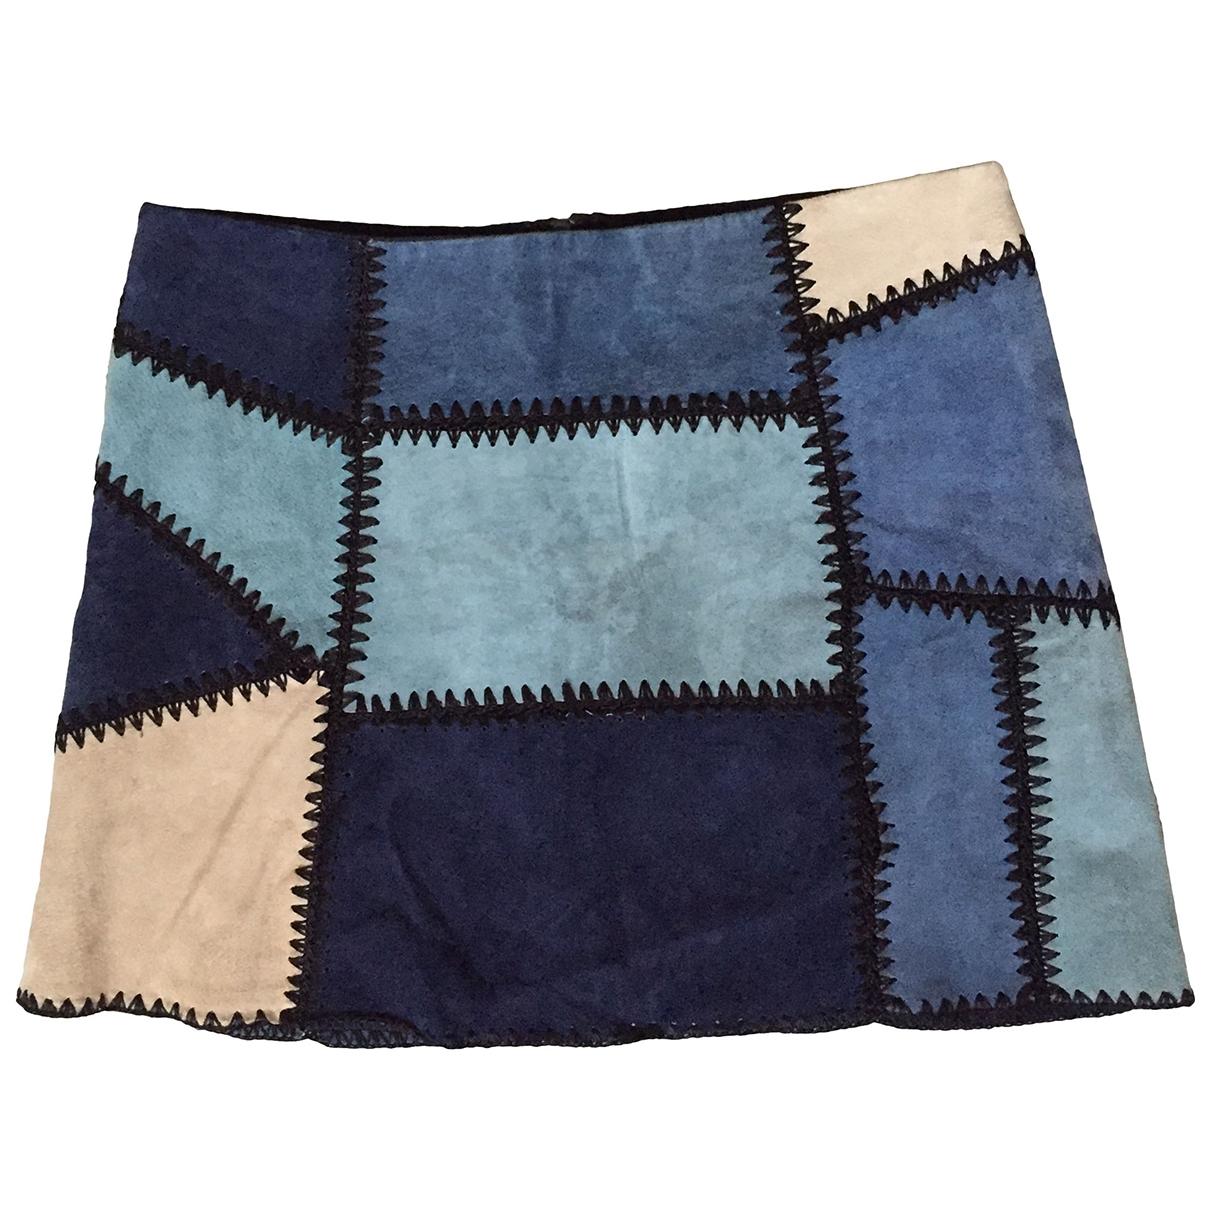 Zara \N Multicolour Suede skirt for Women M International